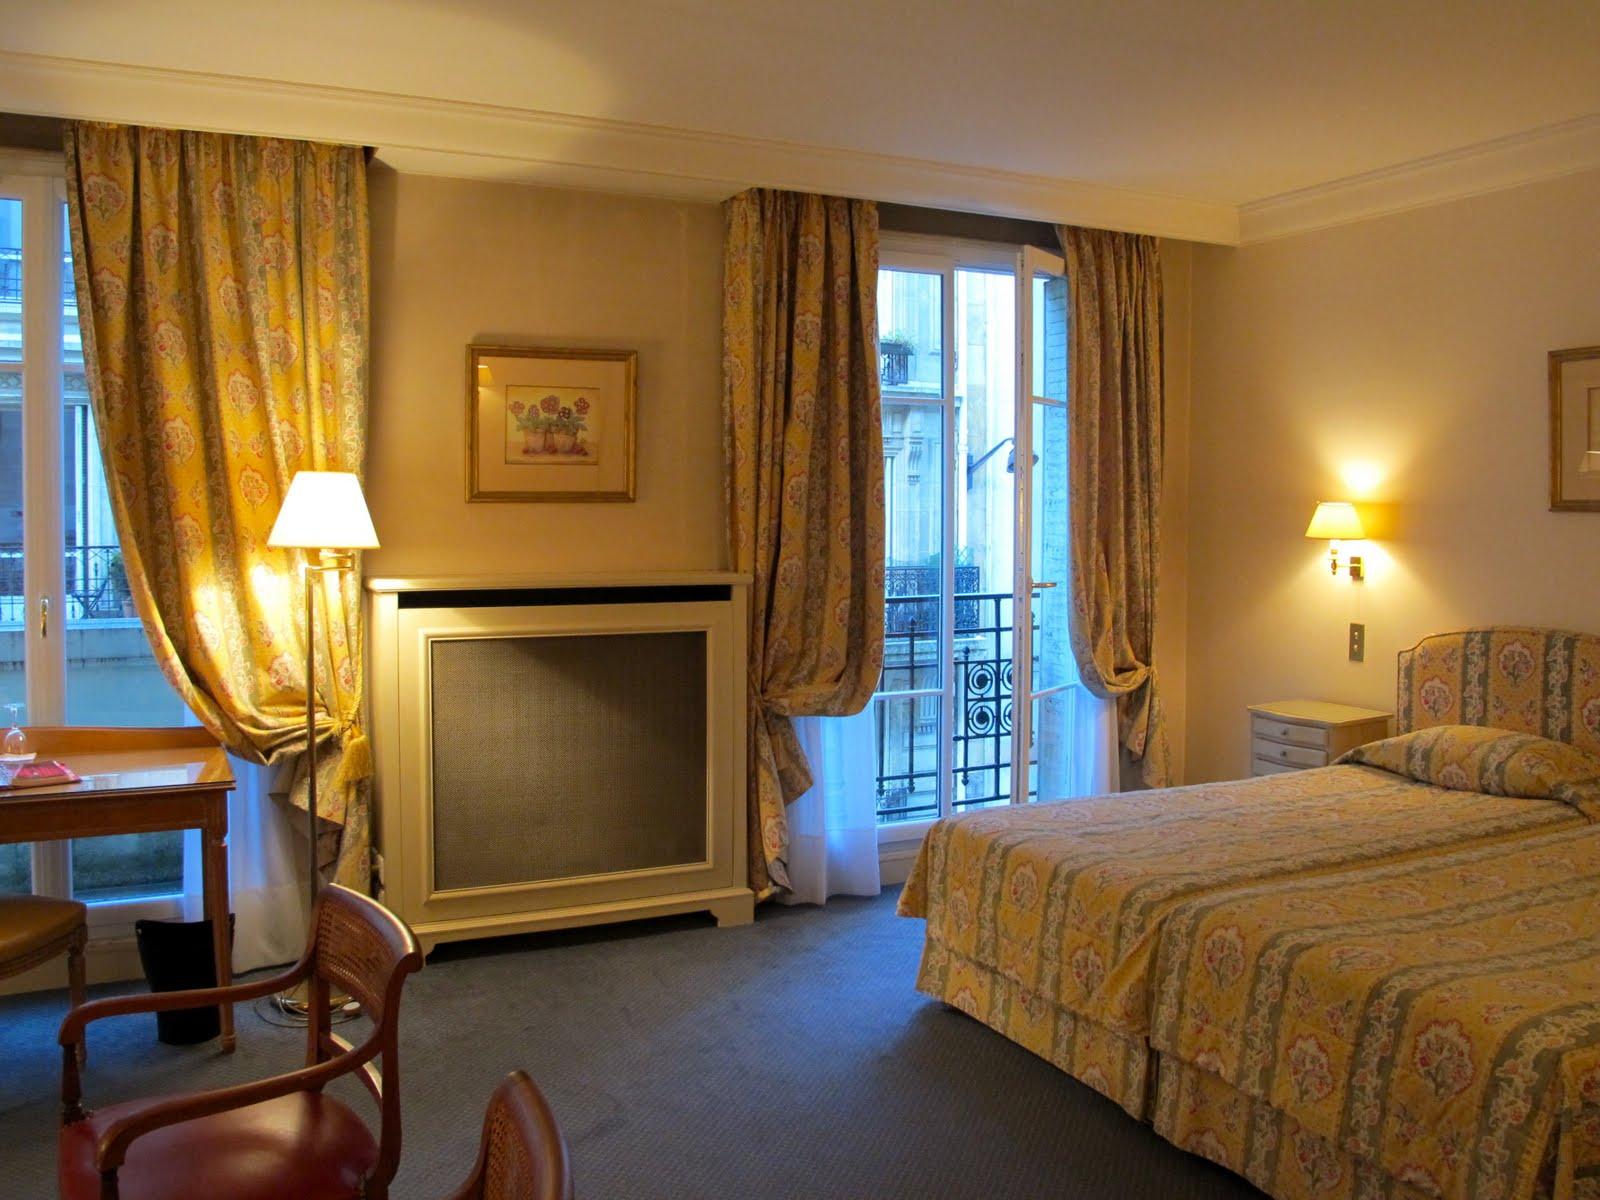 camera suite dreams hotel le littre paris. Black Bedroom Furniture Sets. Home Design Ideas